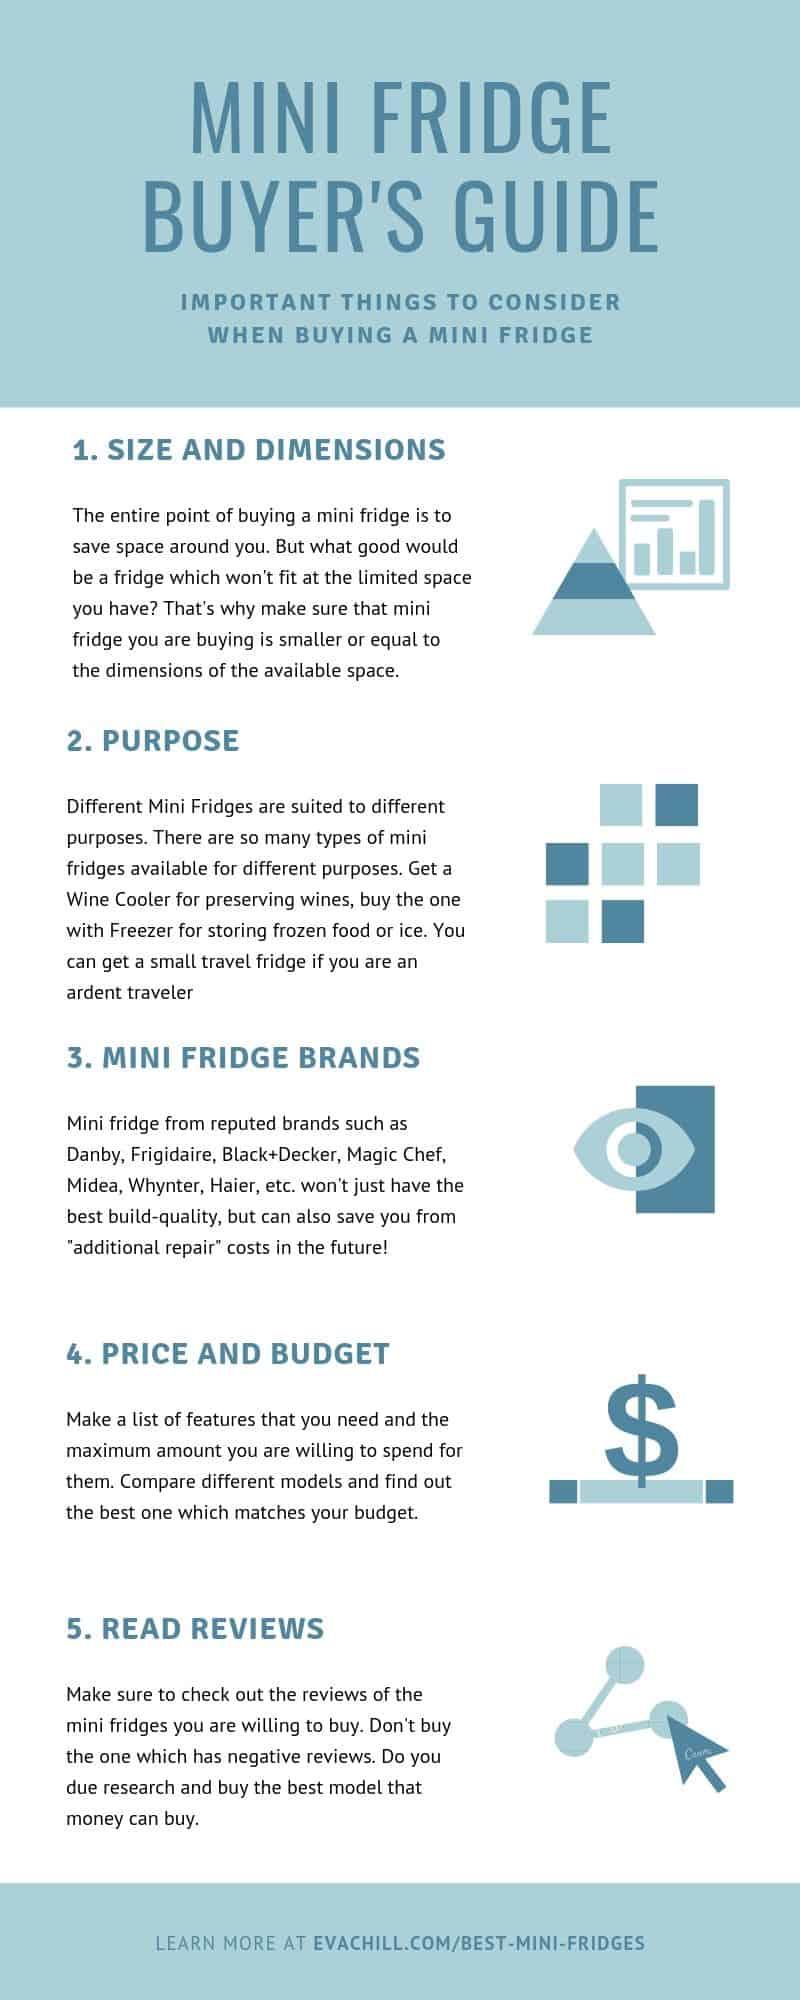 Mini Fridge Infographic by EvaChill